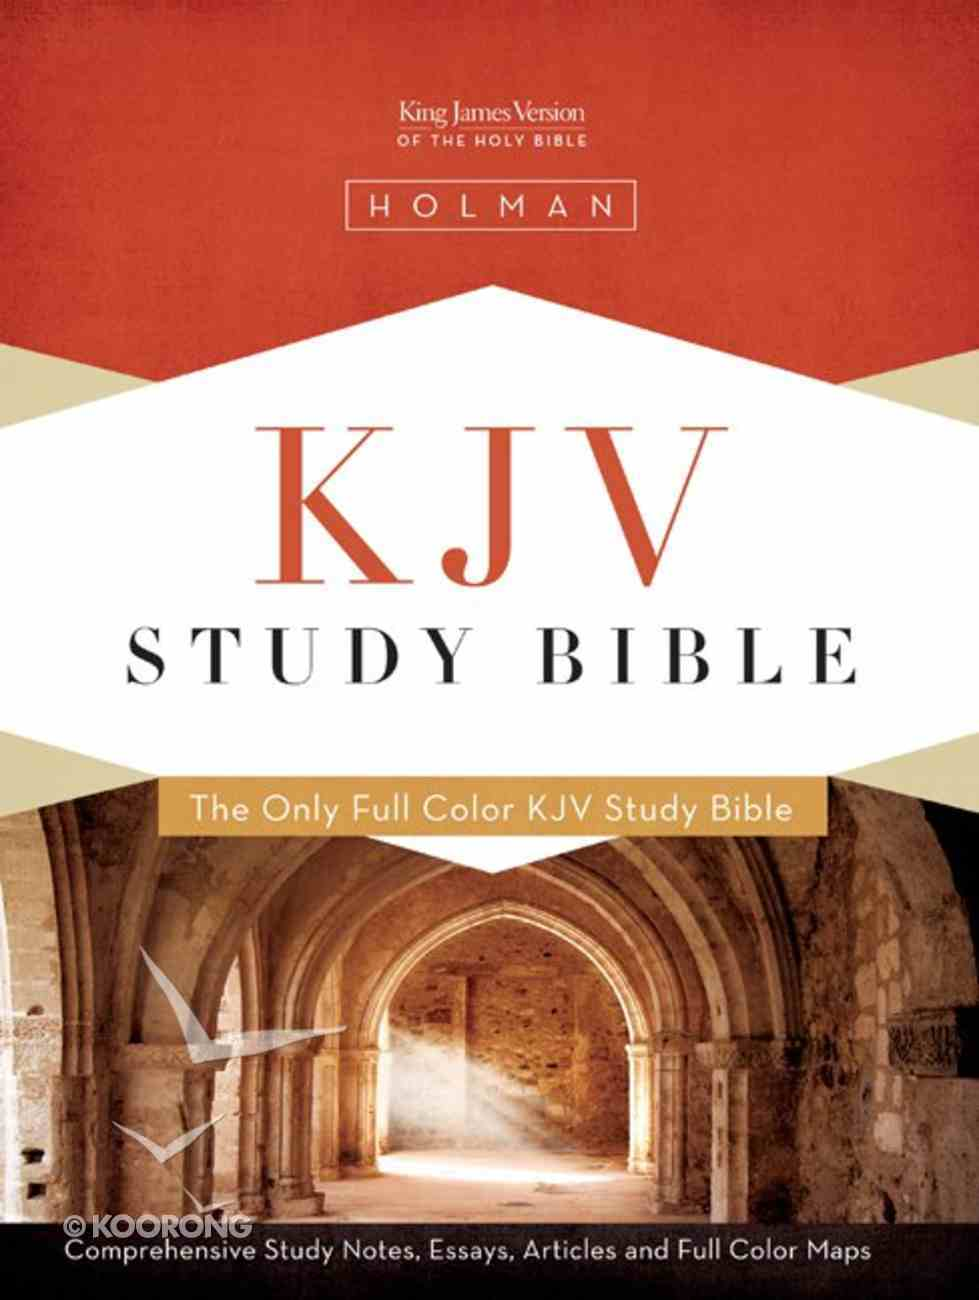 KJV Study Bible Simulated Leather Mantova Brown Imitation Leather